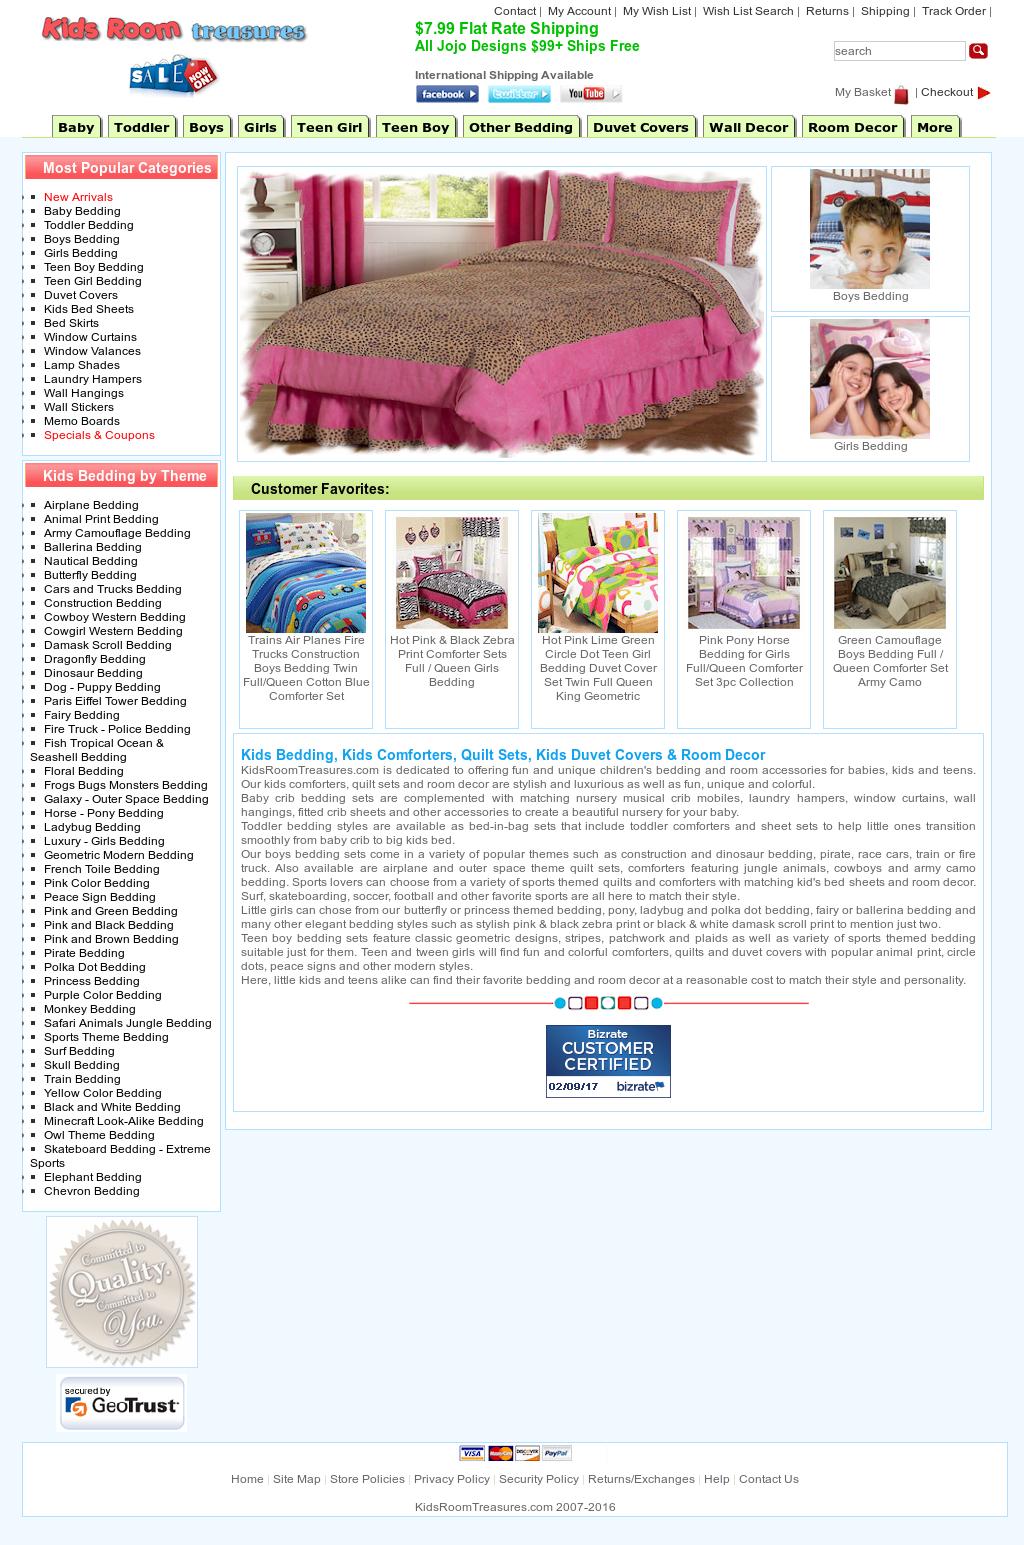 Kids Bedding Kidsroomtreasures Competitors, Revenue And Employees   Owler  Company Profile